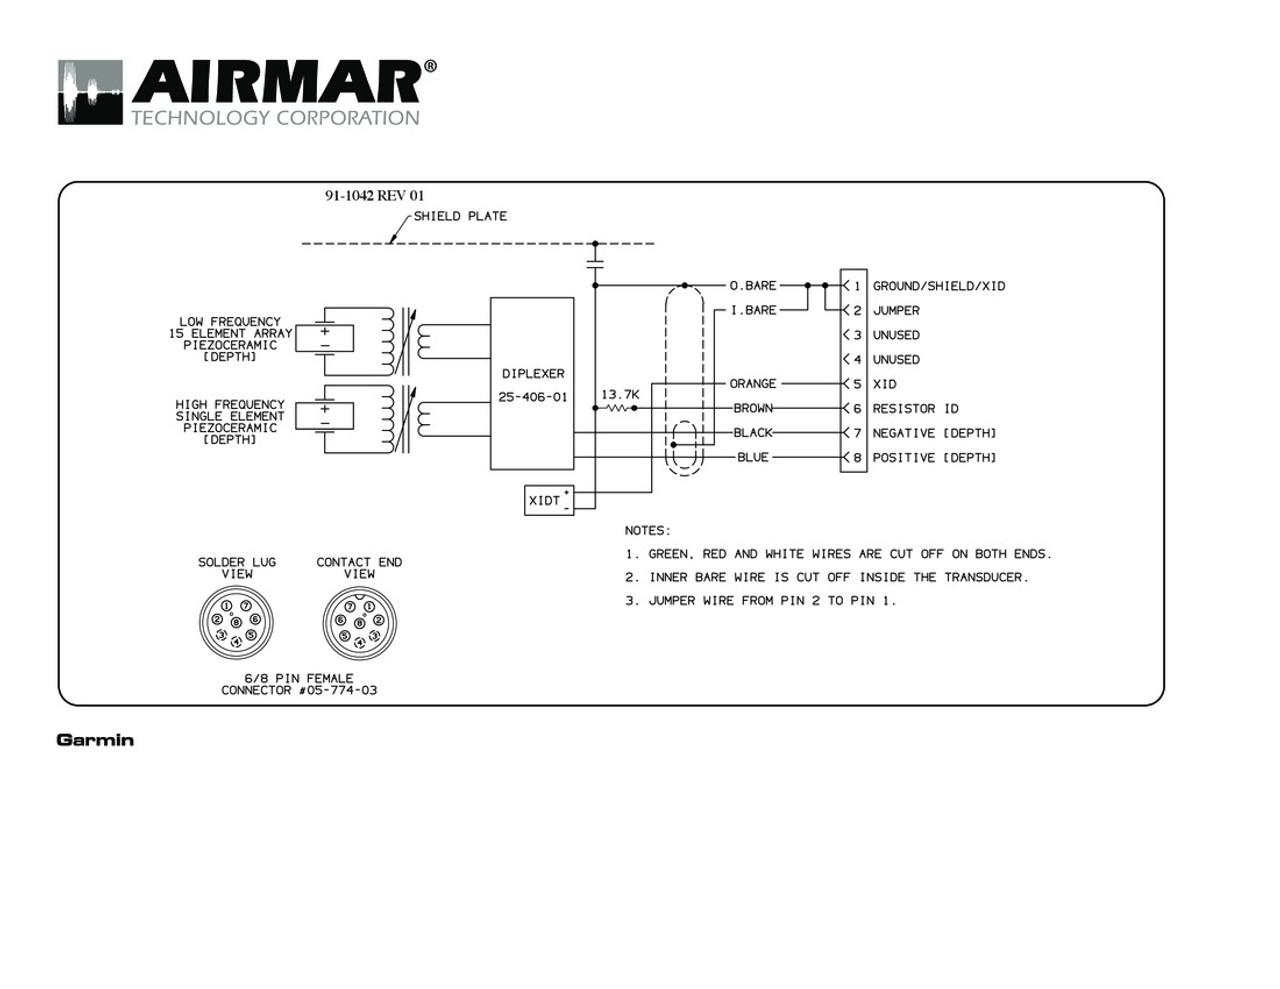 hight resolution of 441s garmin wiring diagram wiring diagram centregarmin gps 441s wiring diagram wiring libraryairmar wiring diagram garmin